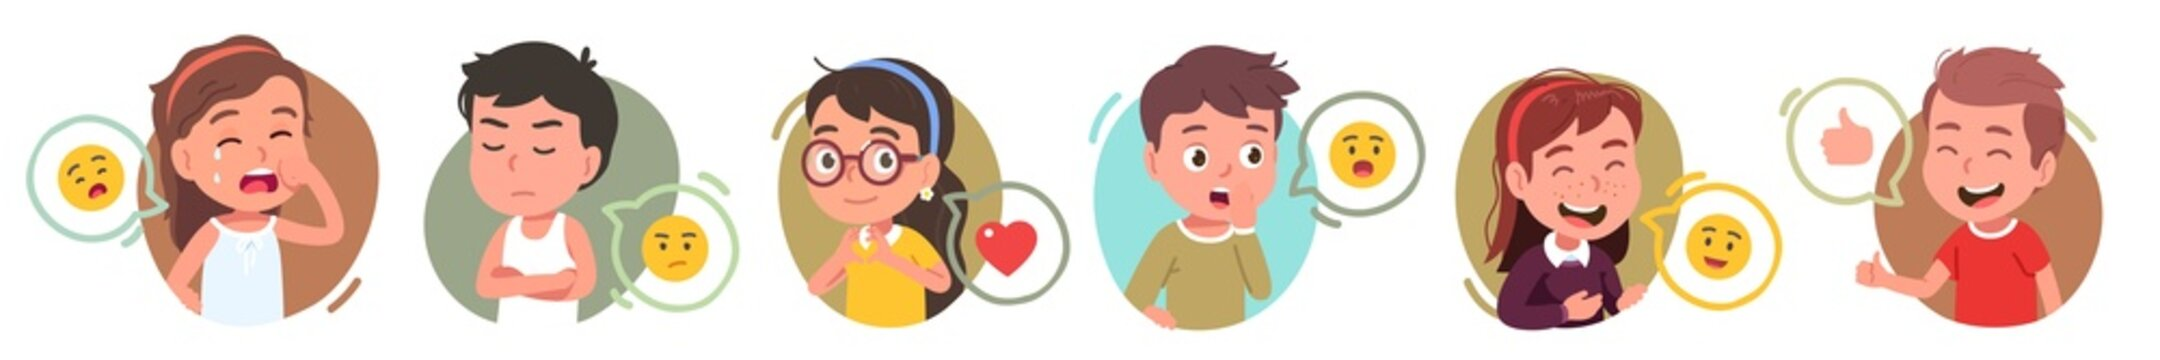 Boys, girls kids gesturing, expressing emotions